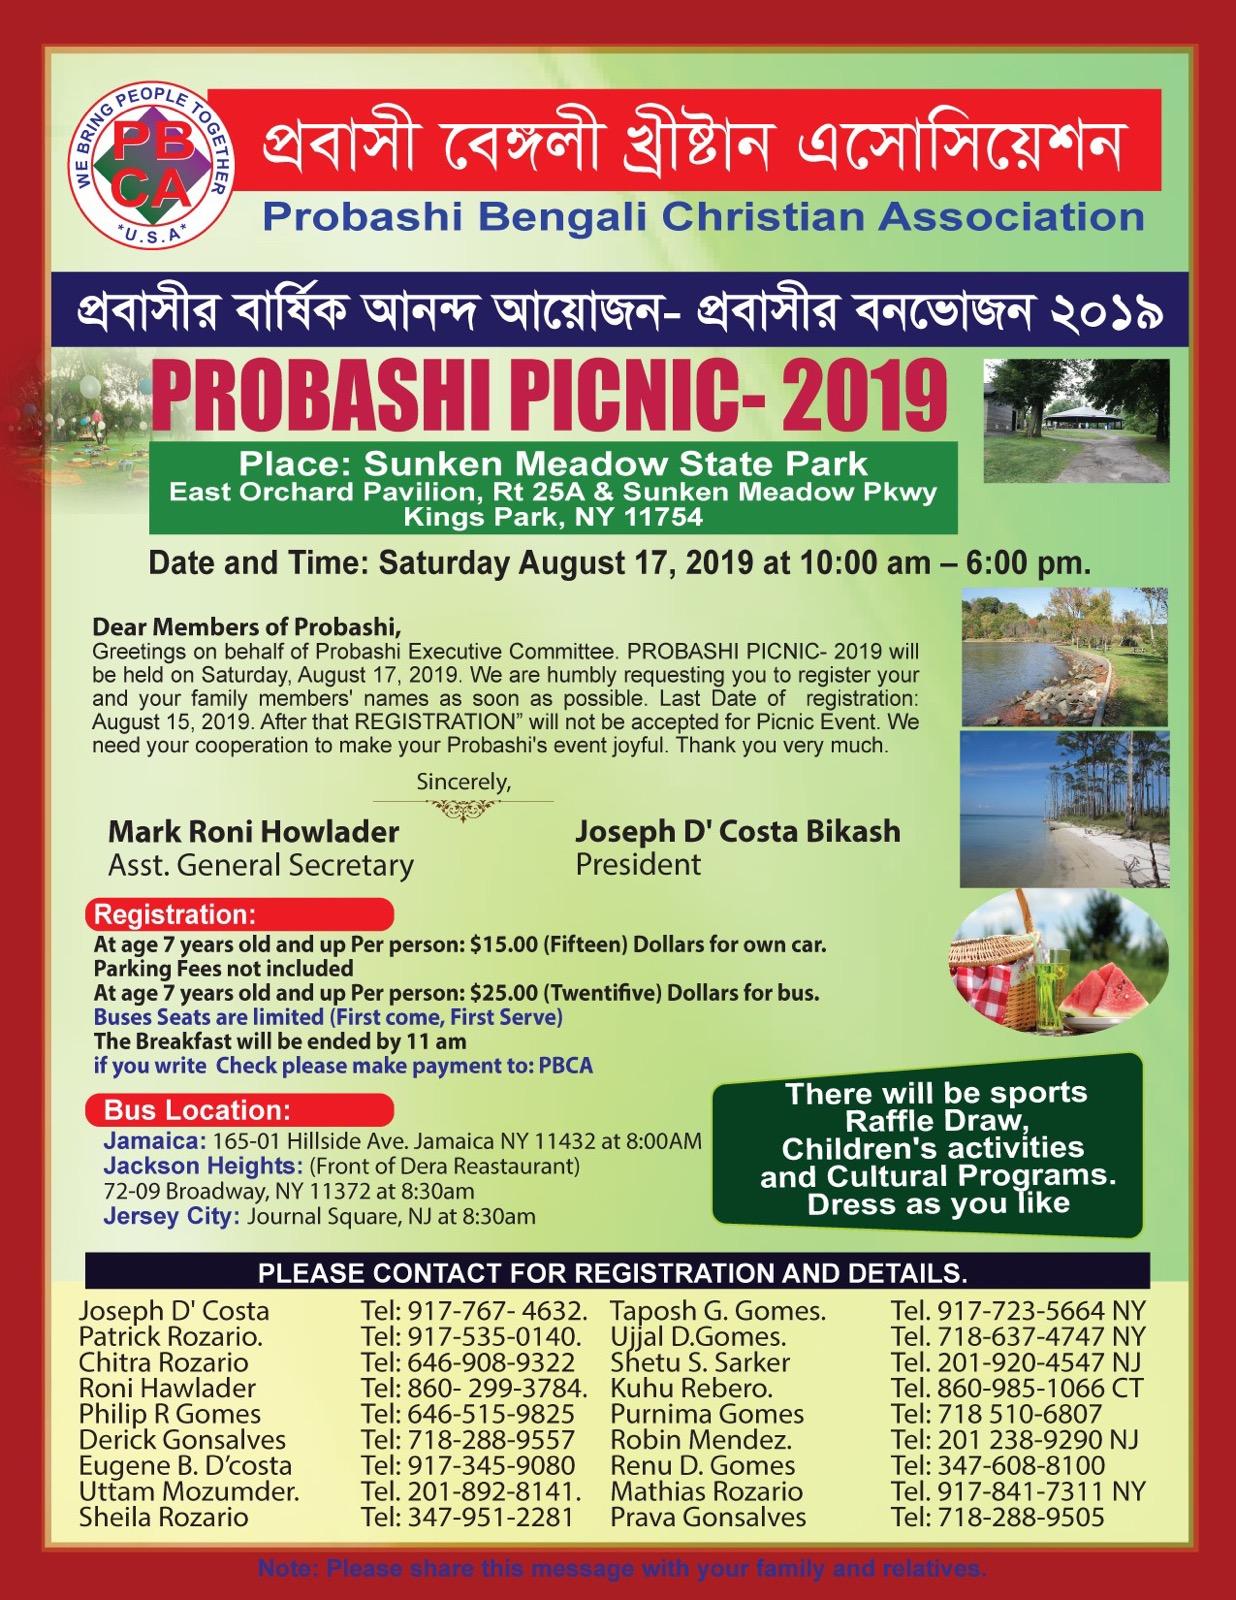 http://www.pbcausa.org/App_Themes/PBCA/Images/Events/Occasional/2019/PBCA-Picnic-2019.jpg